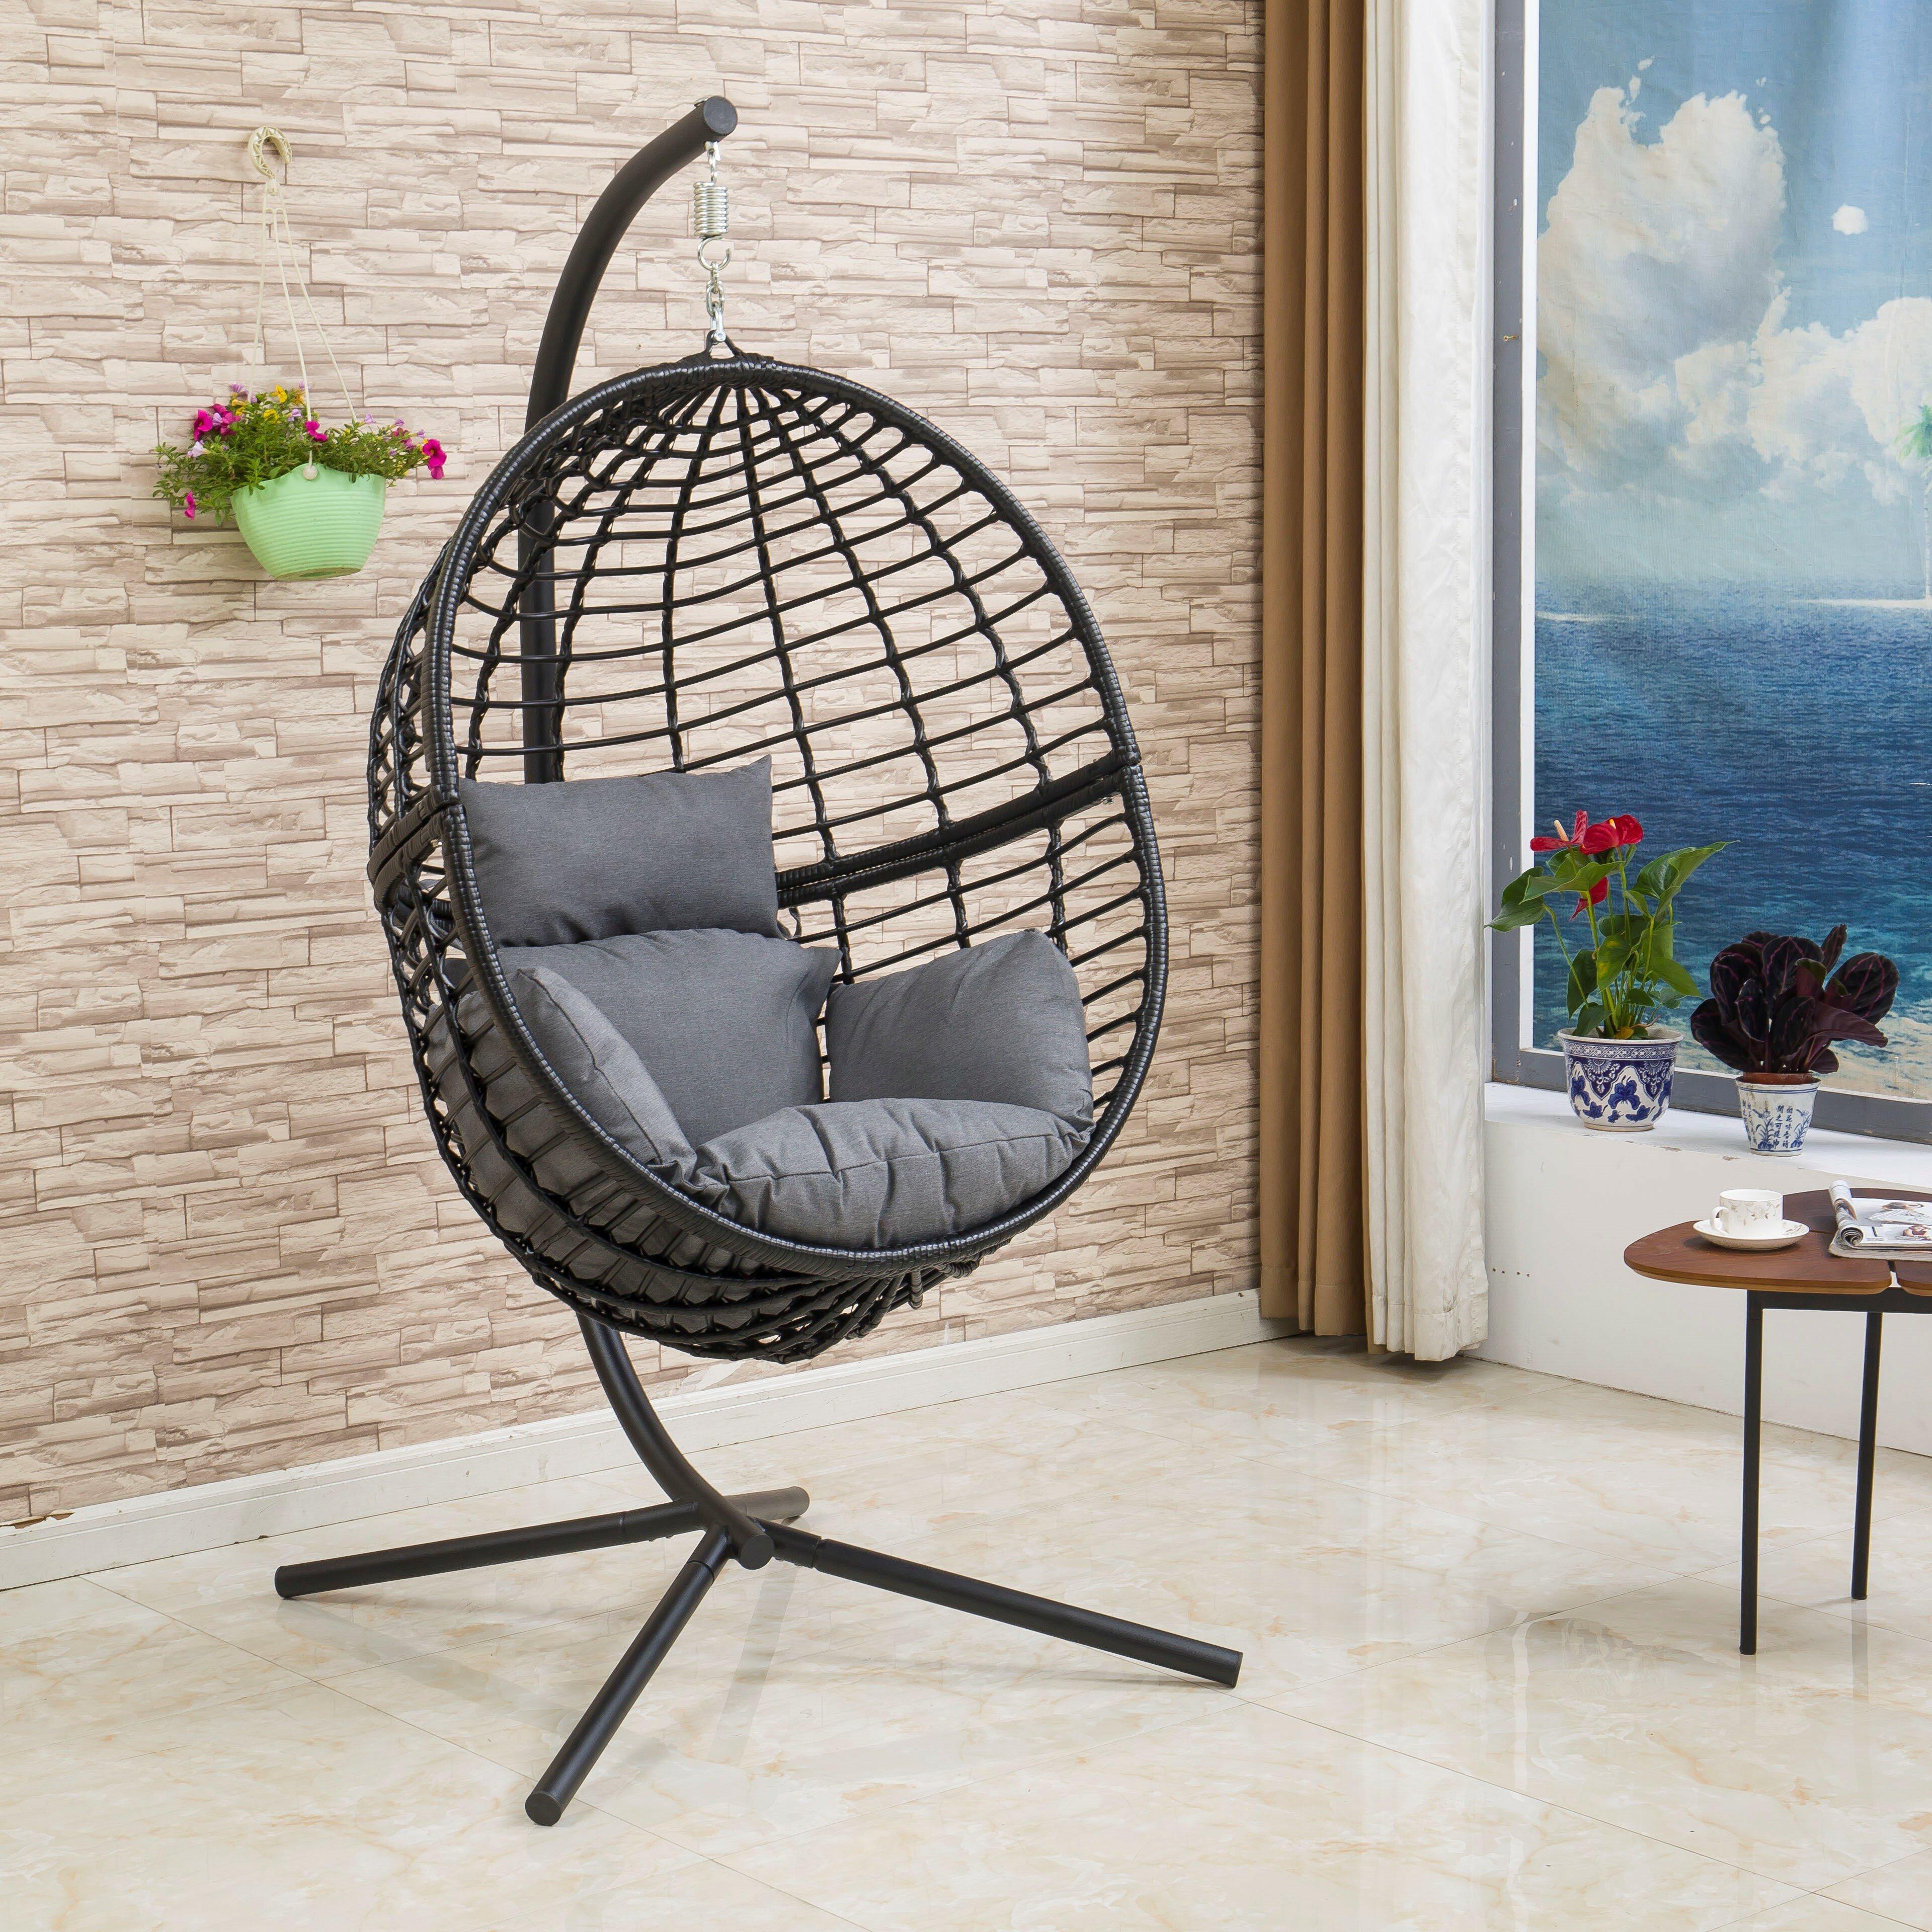 Brayden Studio Tinnin Eggplant Swing Chair With Stand Reviews